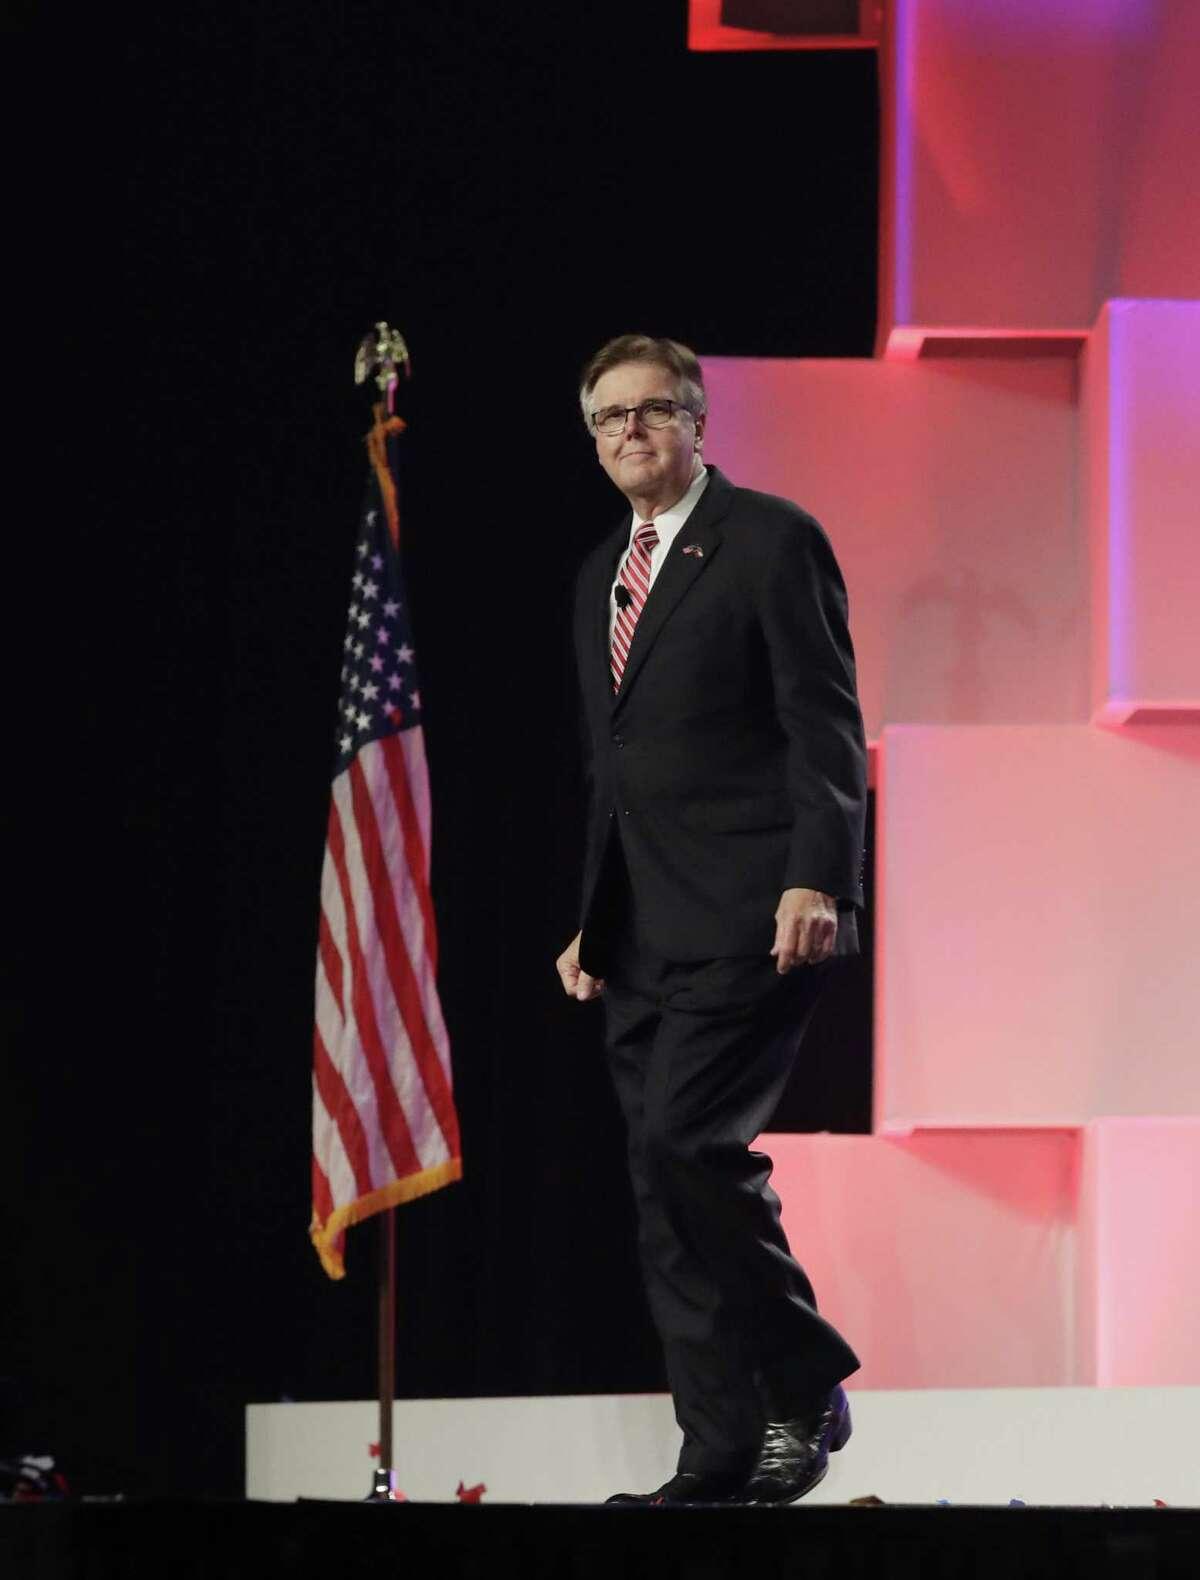 Lt. Gov. Dan Patrick arrives for the Texas GOP Convention in San Antonio on June 15.